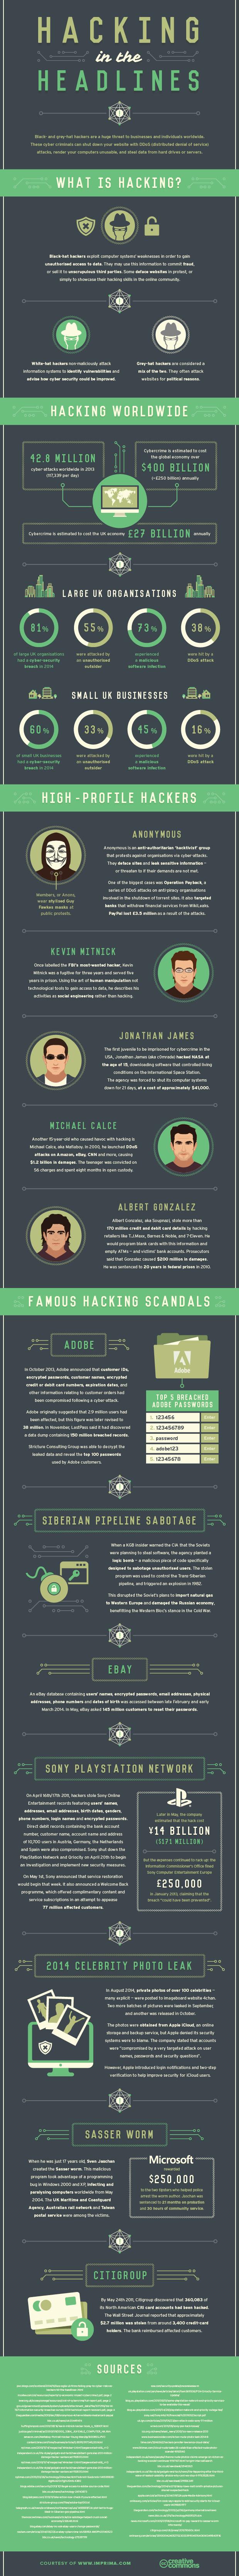 Hacking in the Headlines